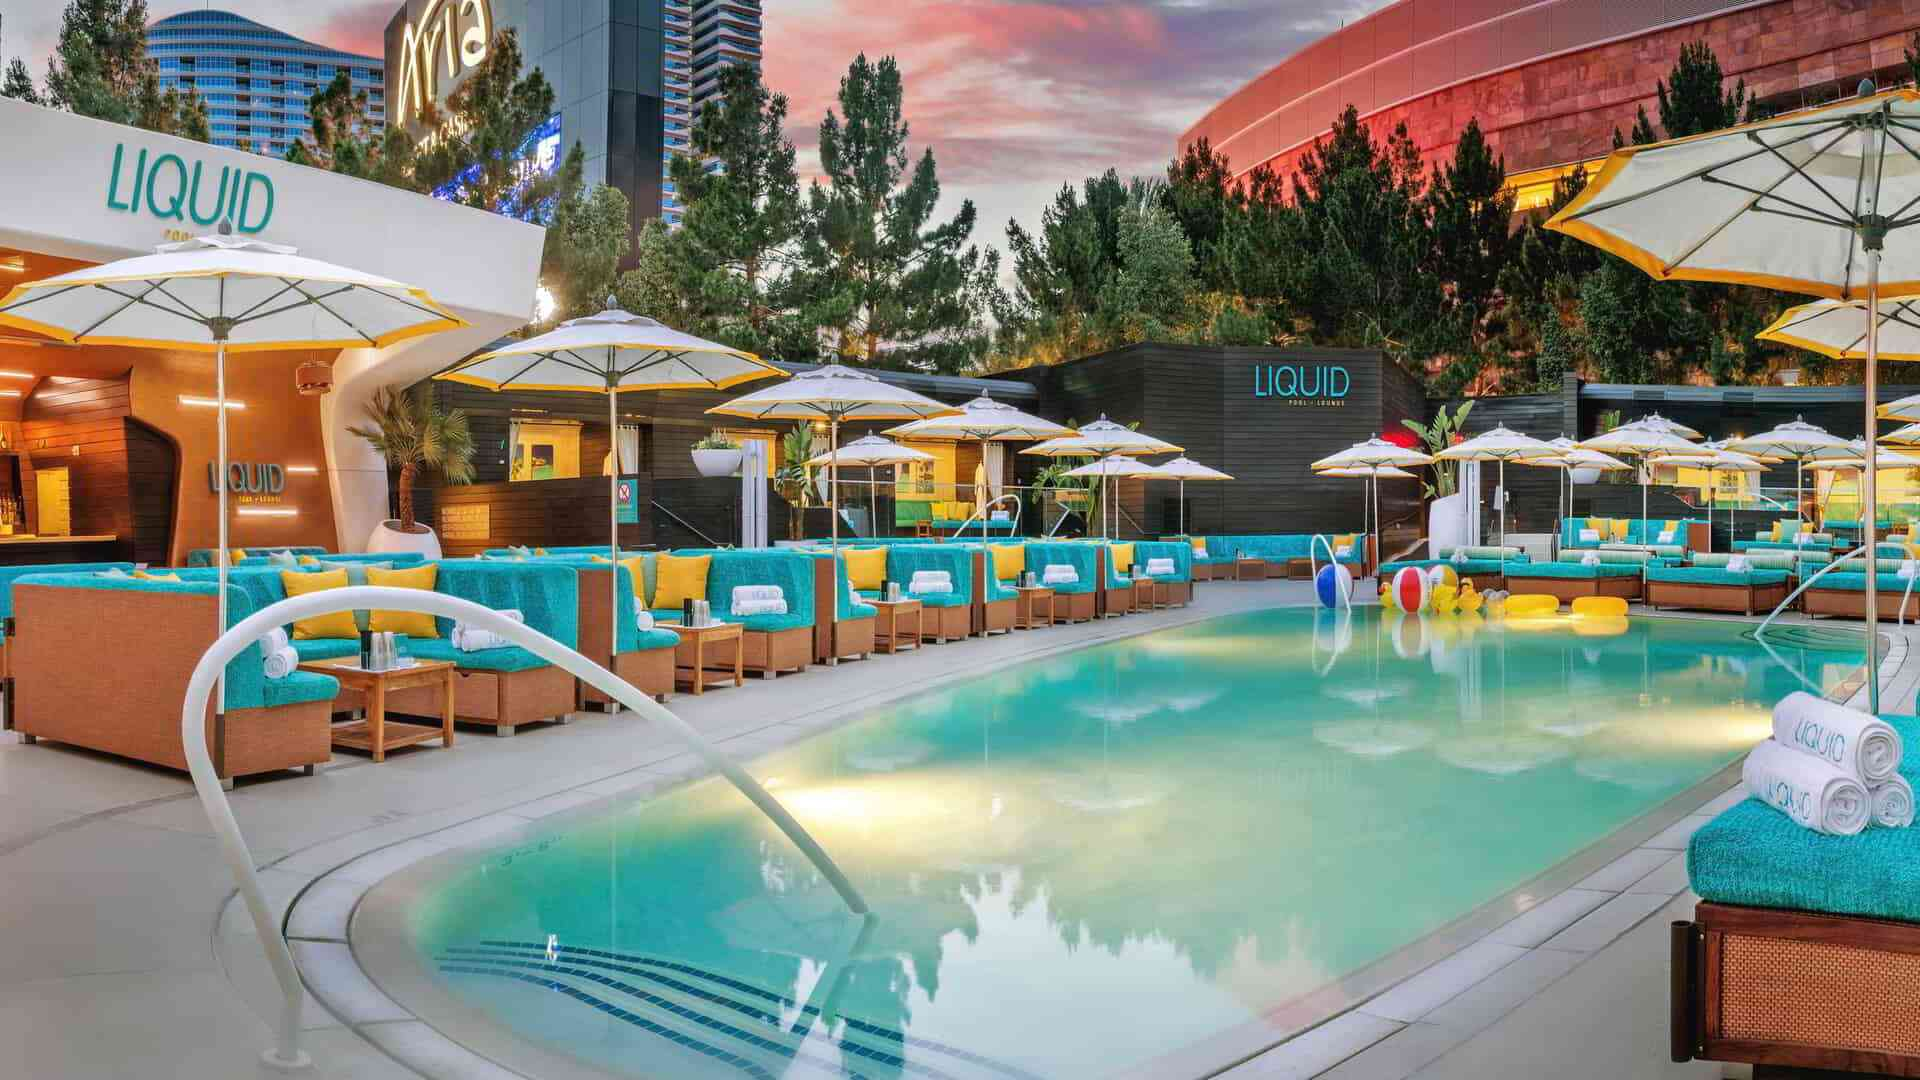 Aria Liquid pool bar